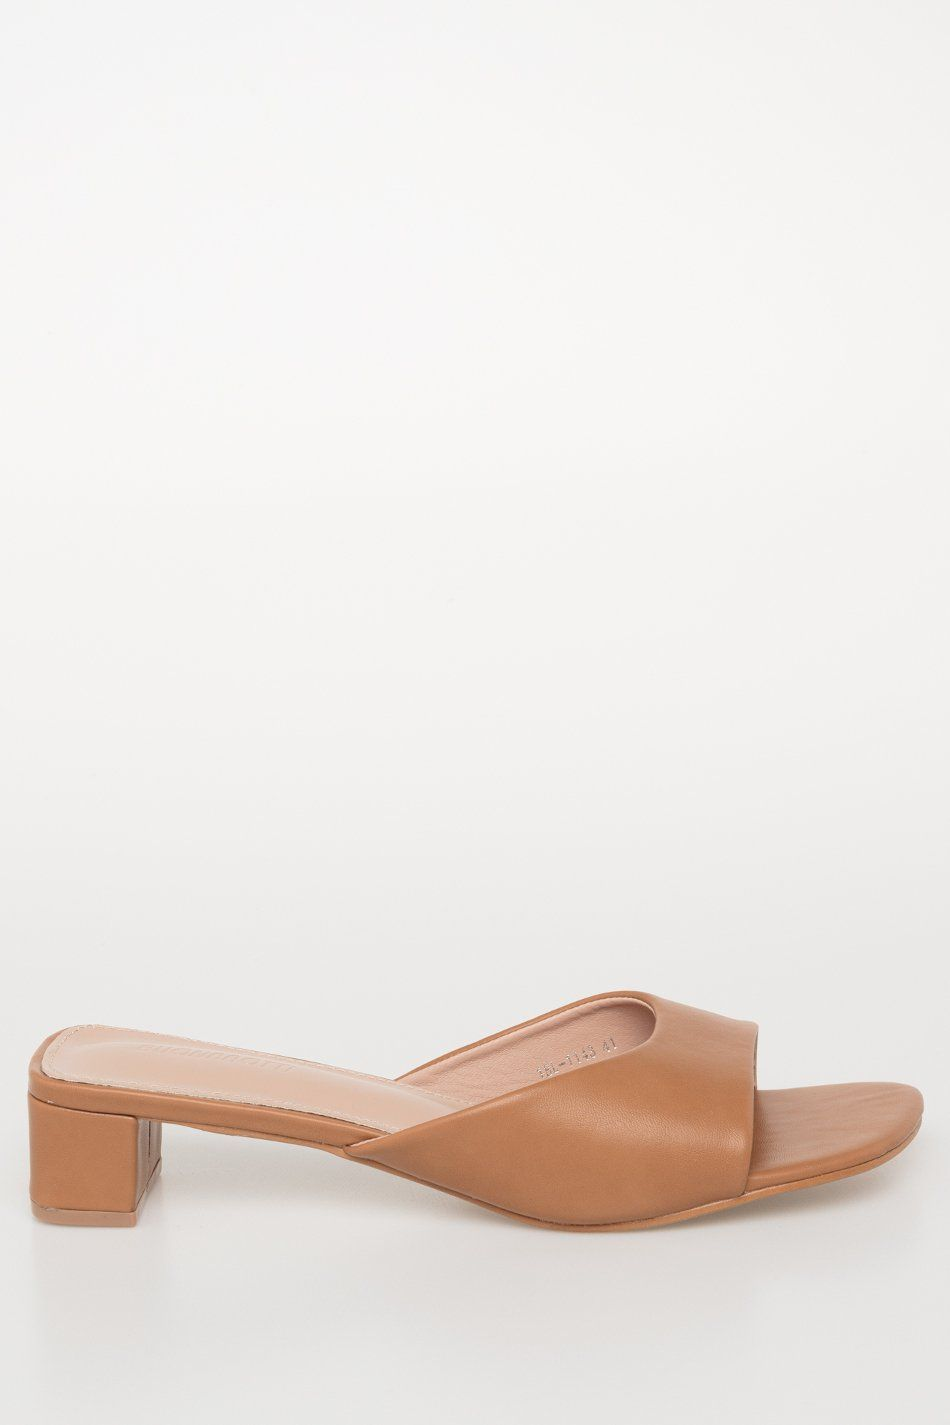 Sandalia abierta tacón ancho camel